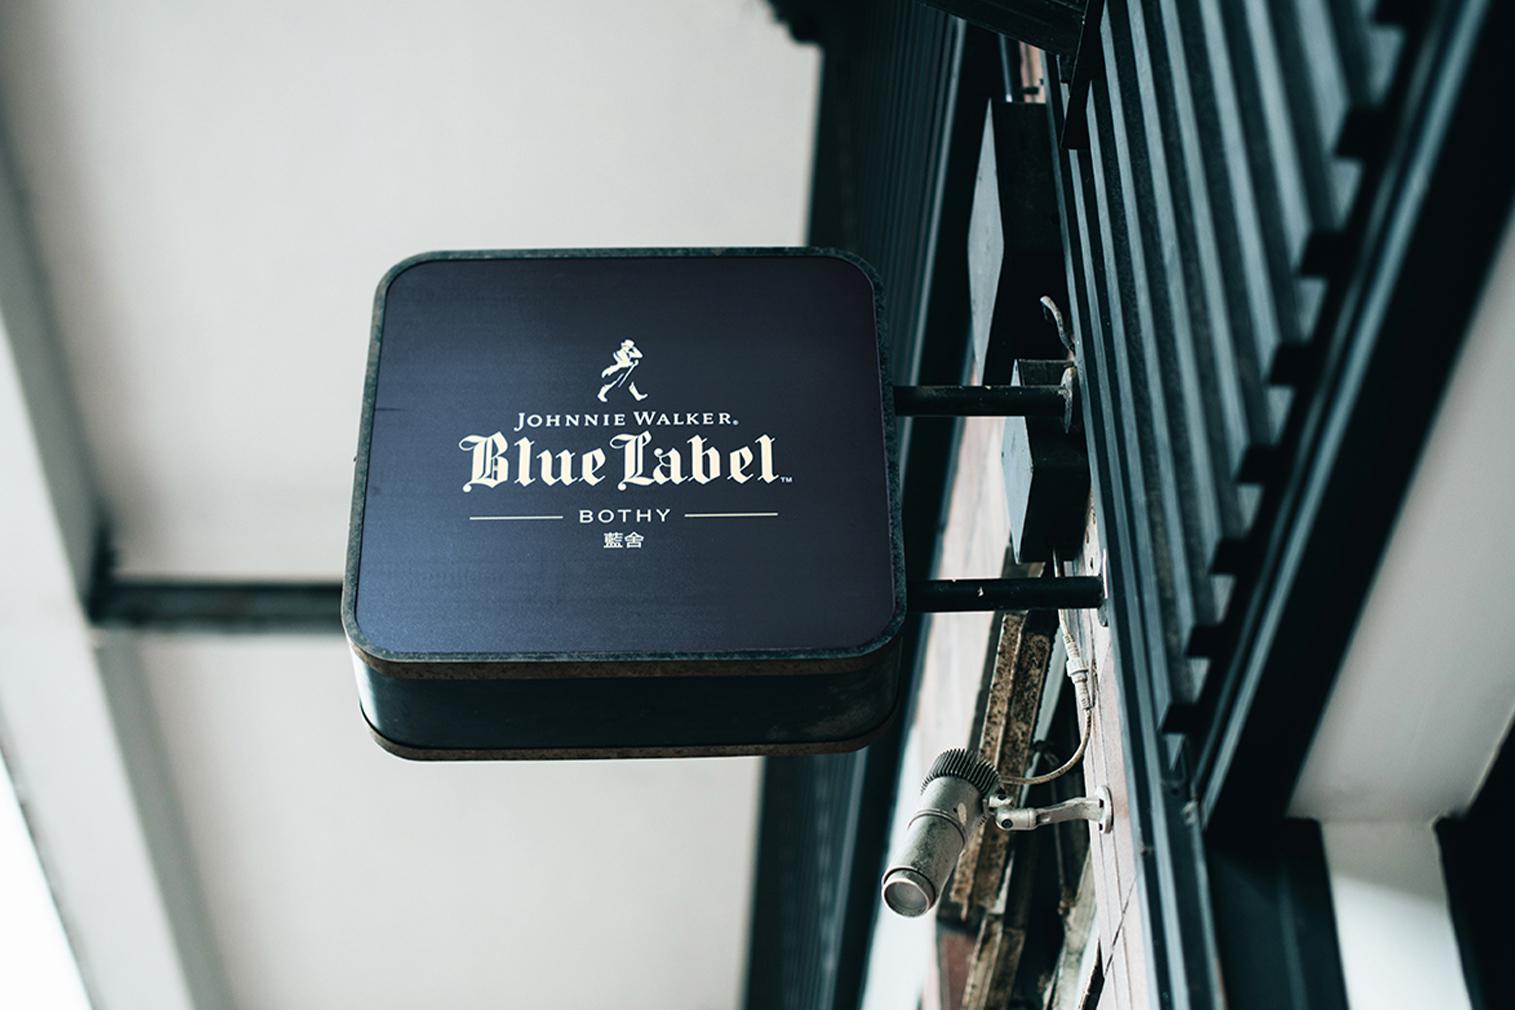 Johnnie Walker  Blue Label Bothy - Hong Kong